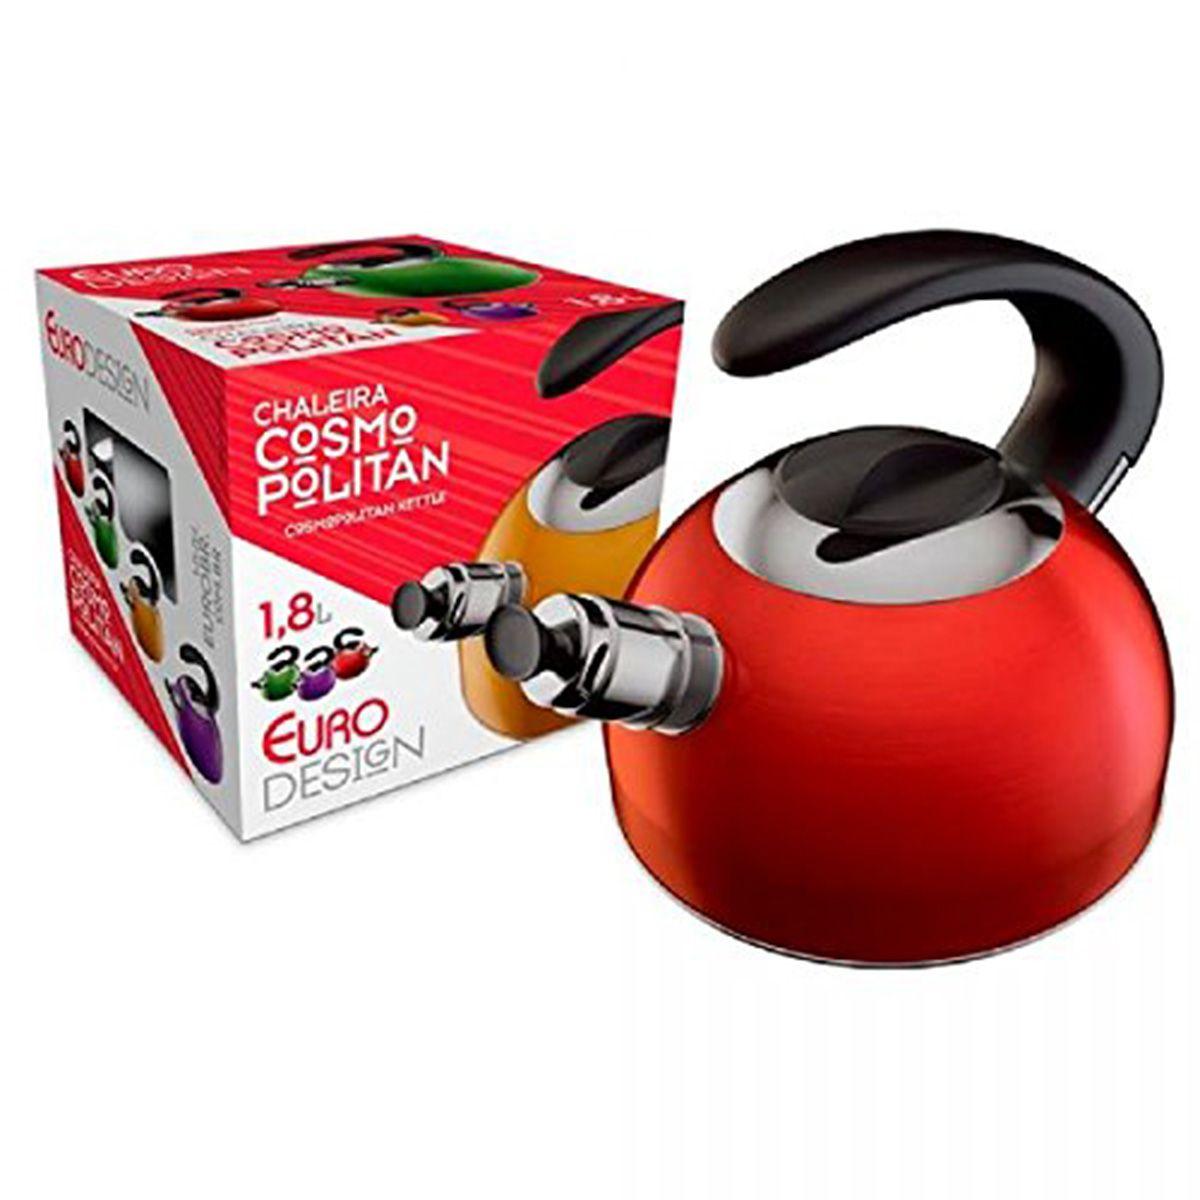 Chaleira Euro 1.8 Lts | Lojas Estrela